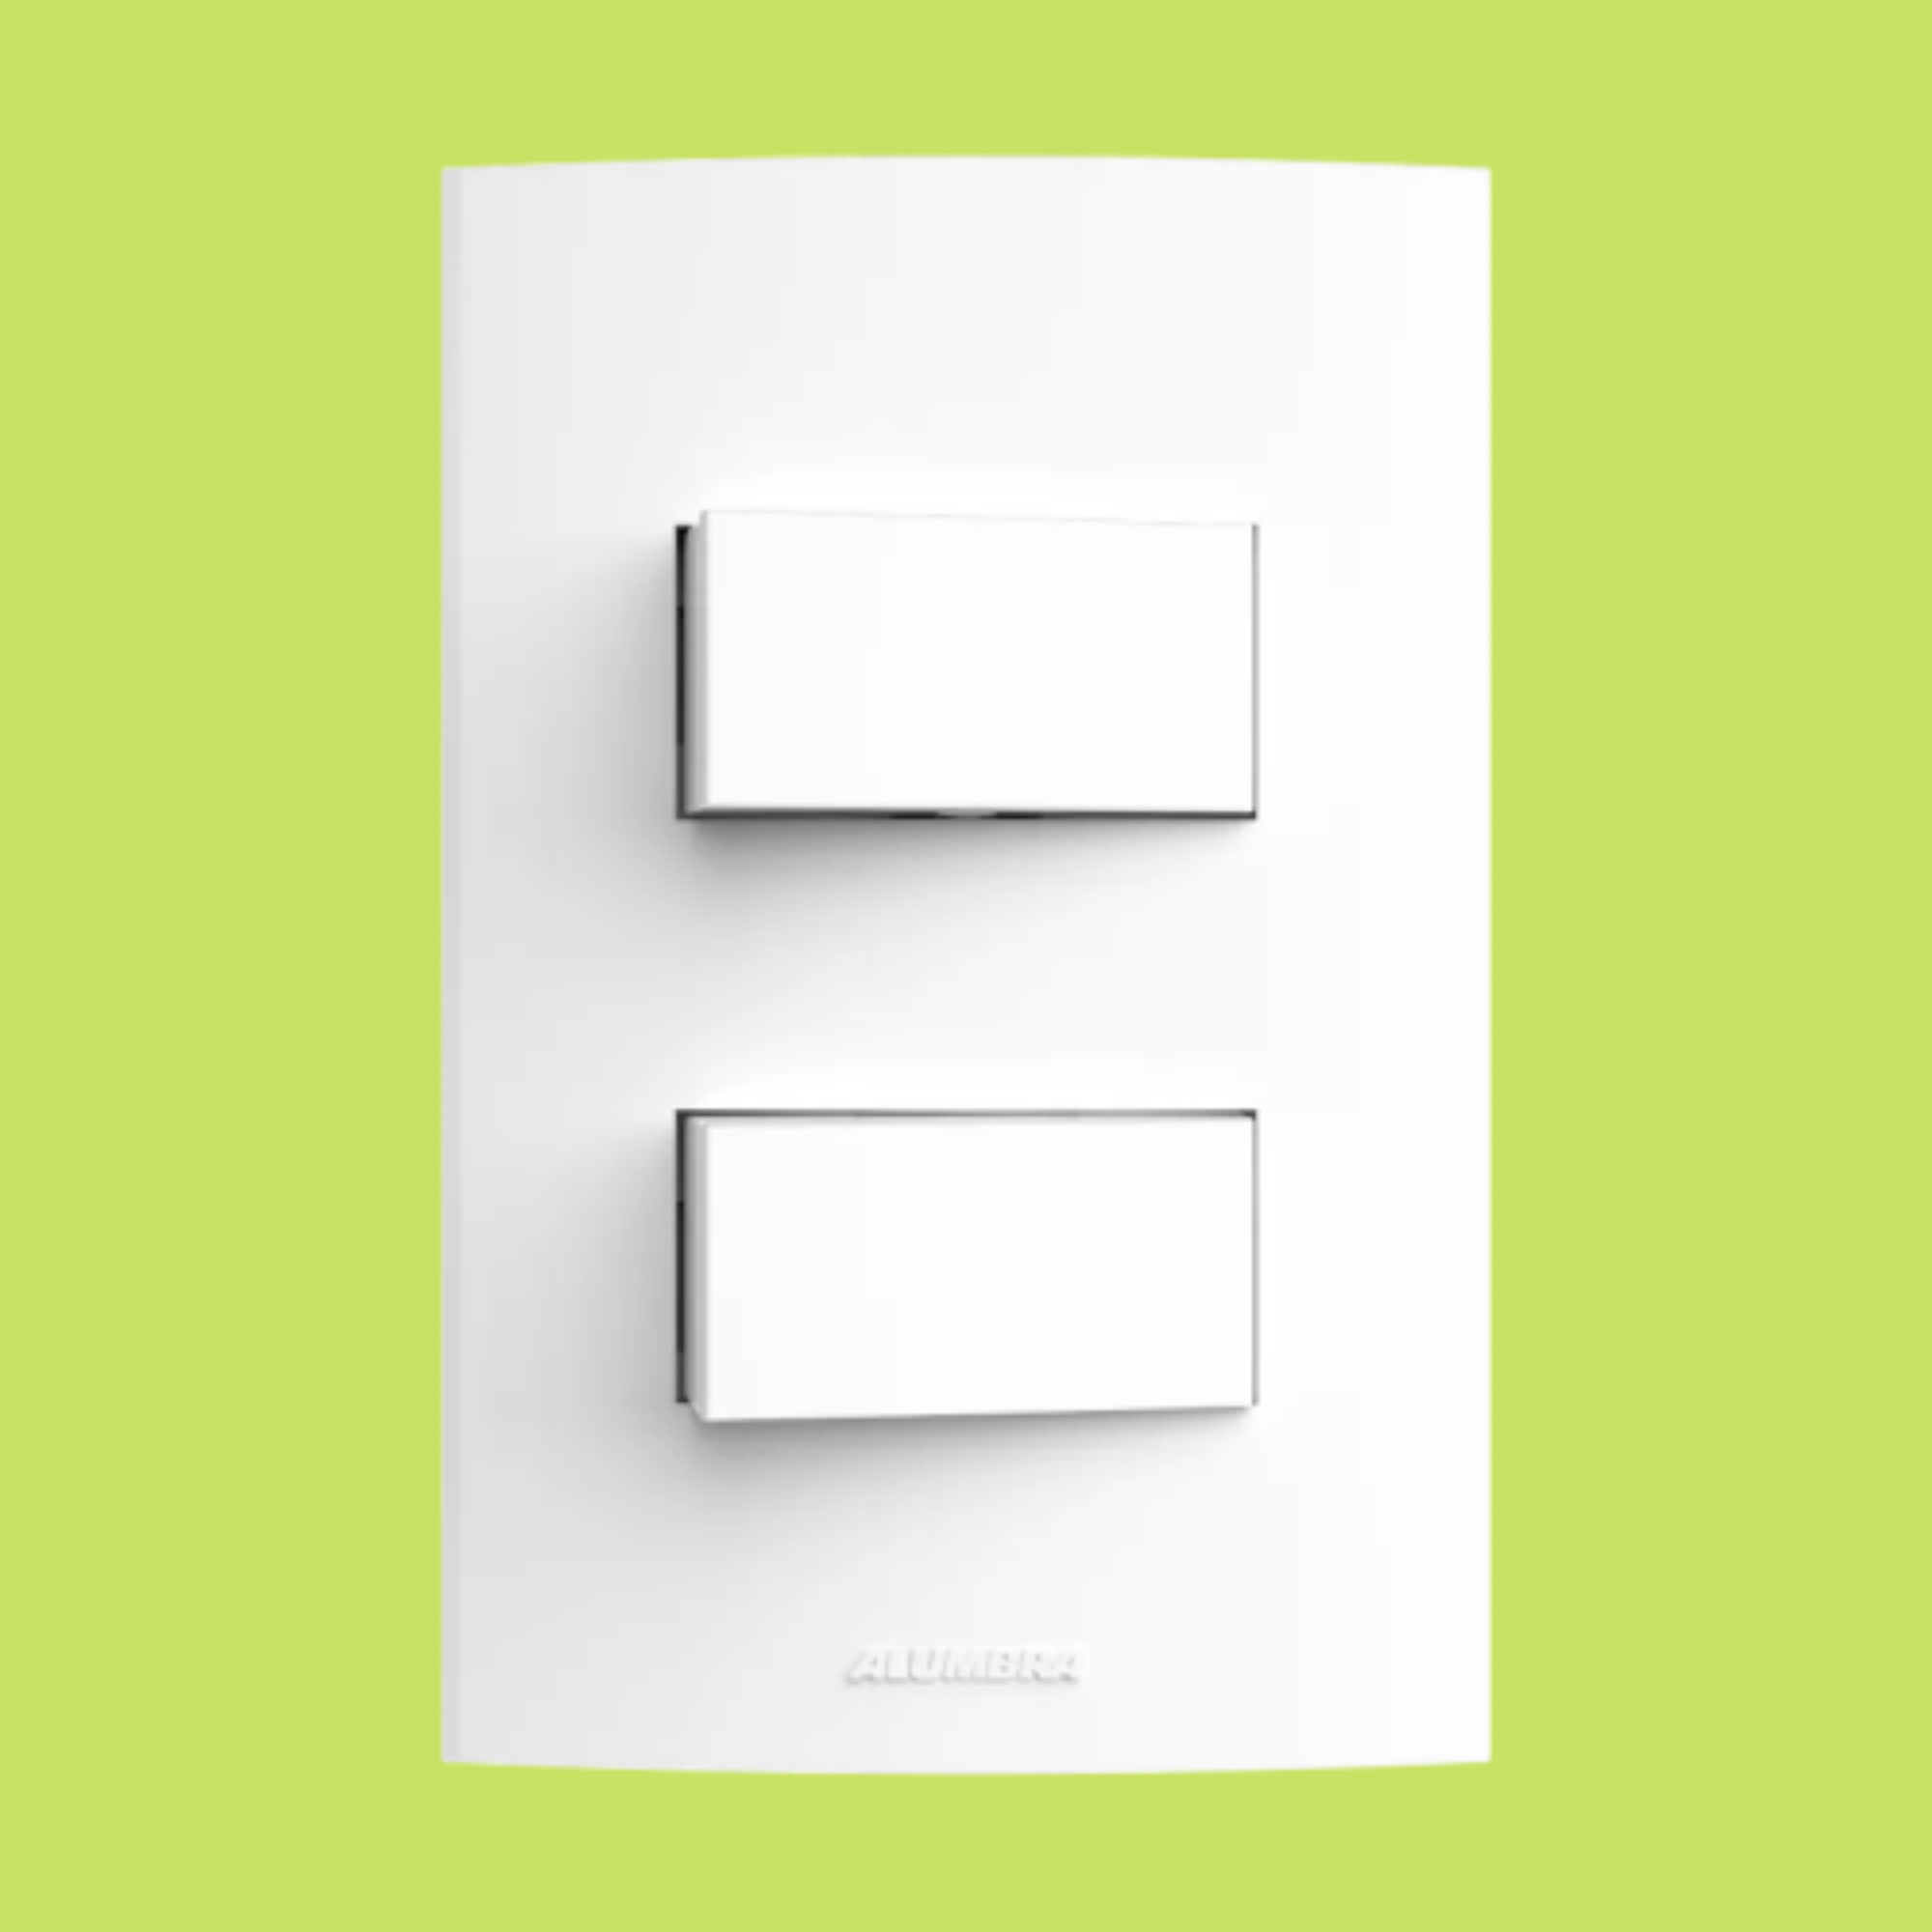 Inova Pró 2 Seções de Interruptor Simples Com Placa